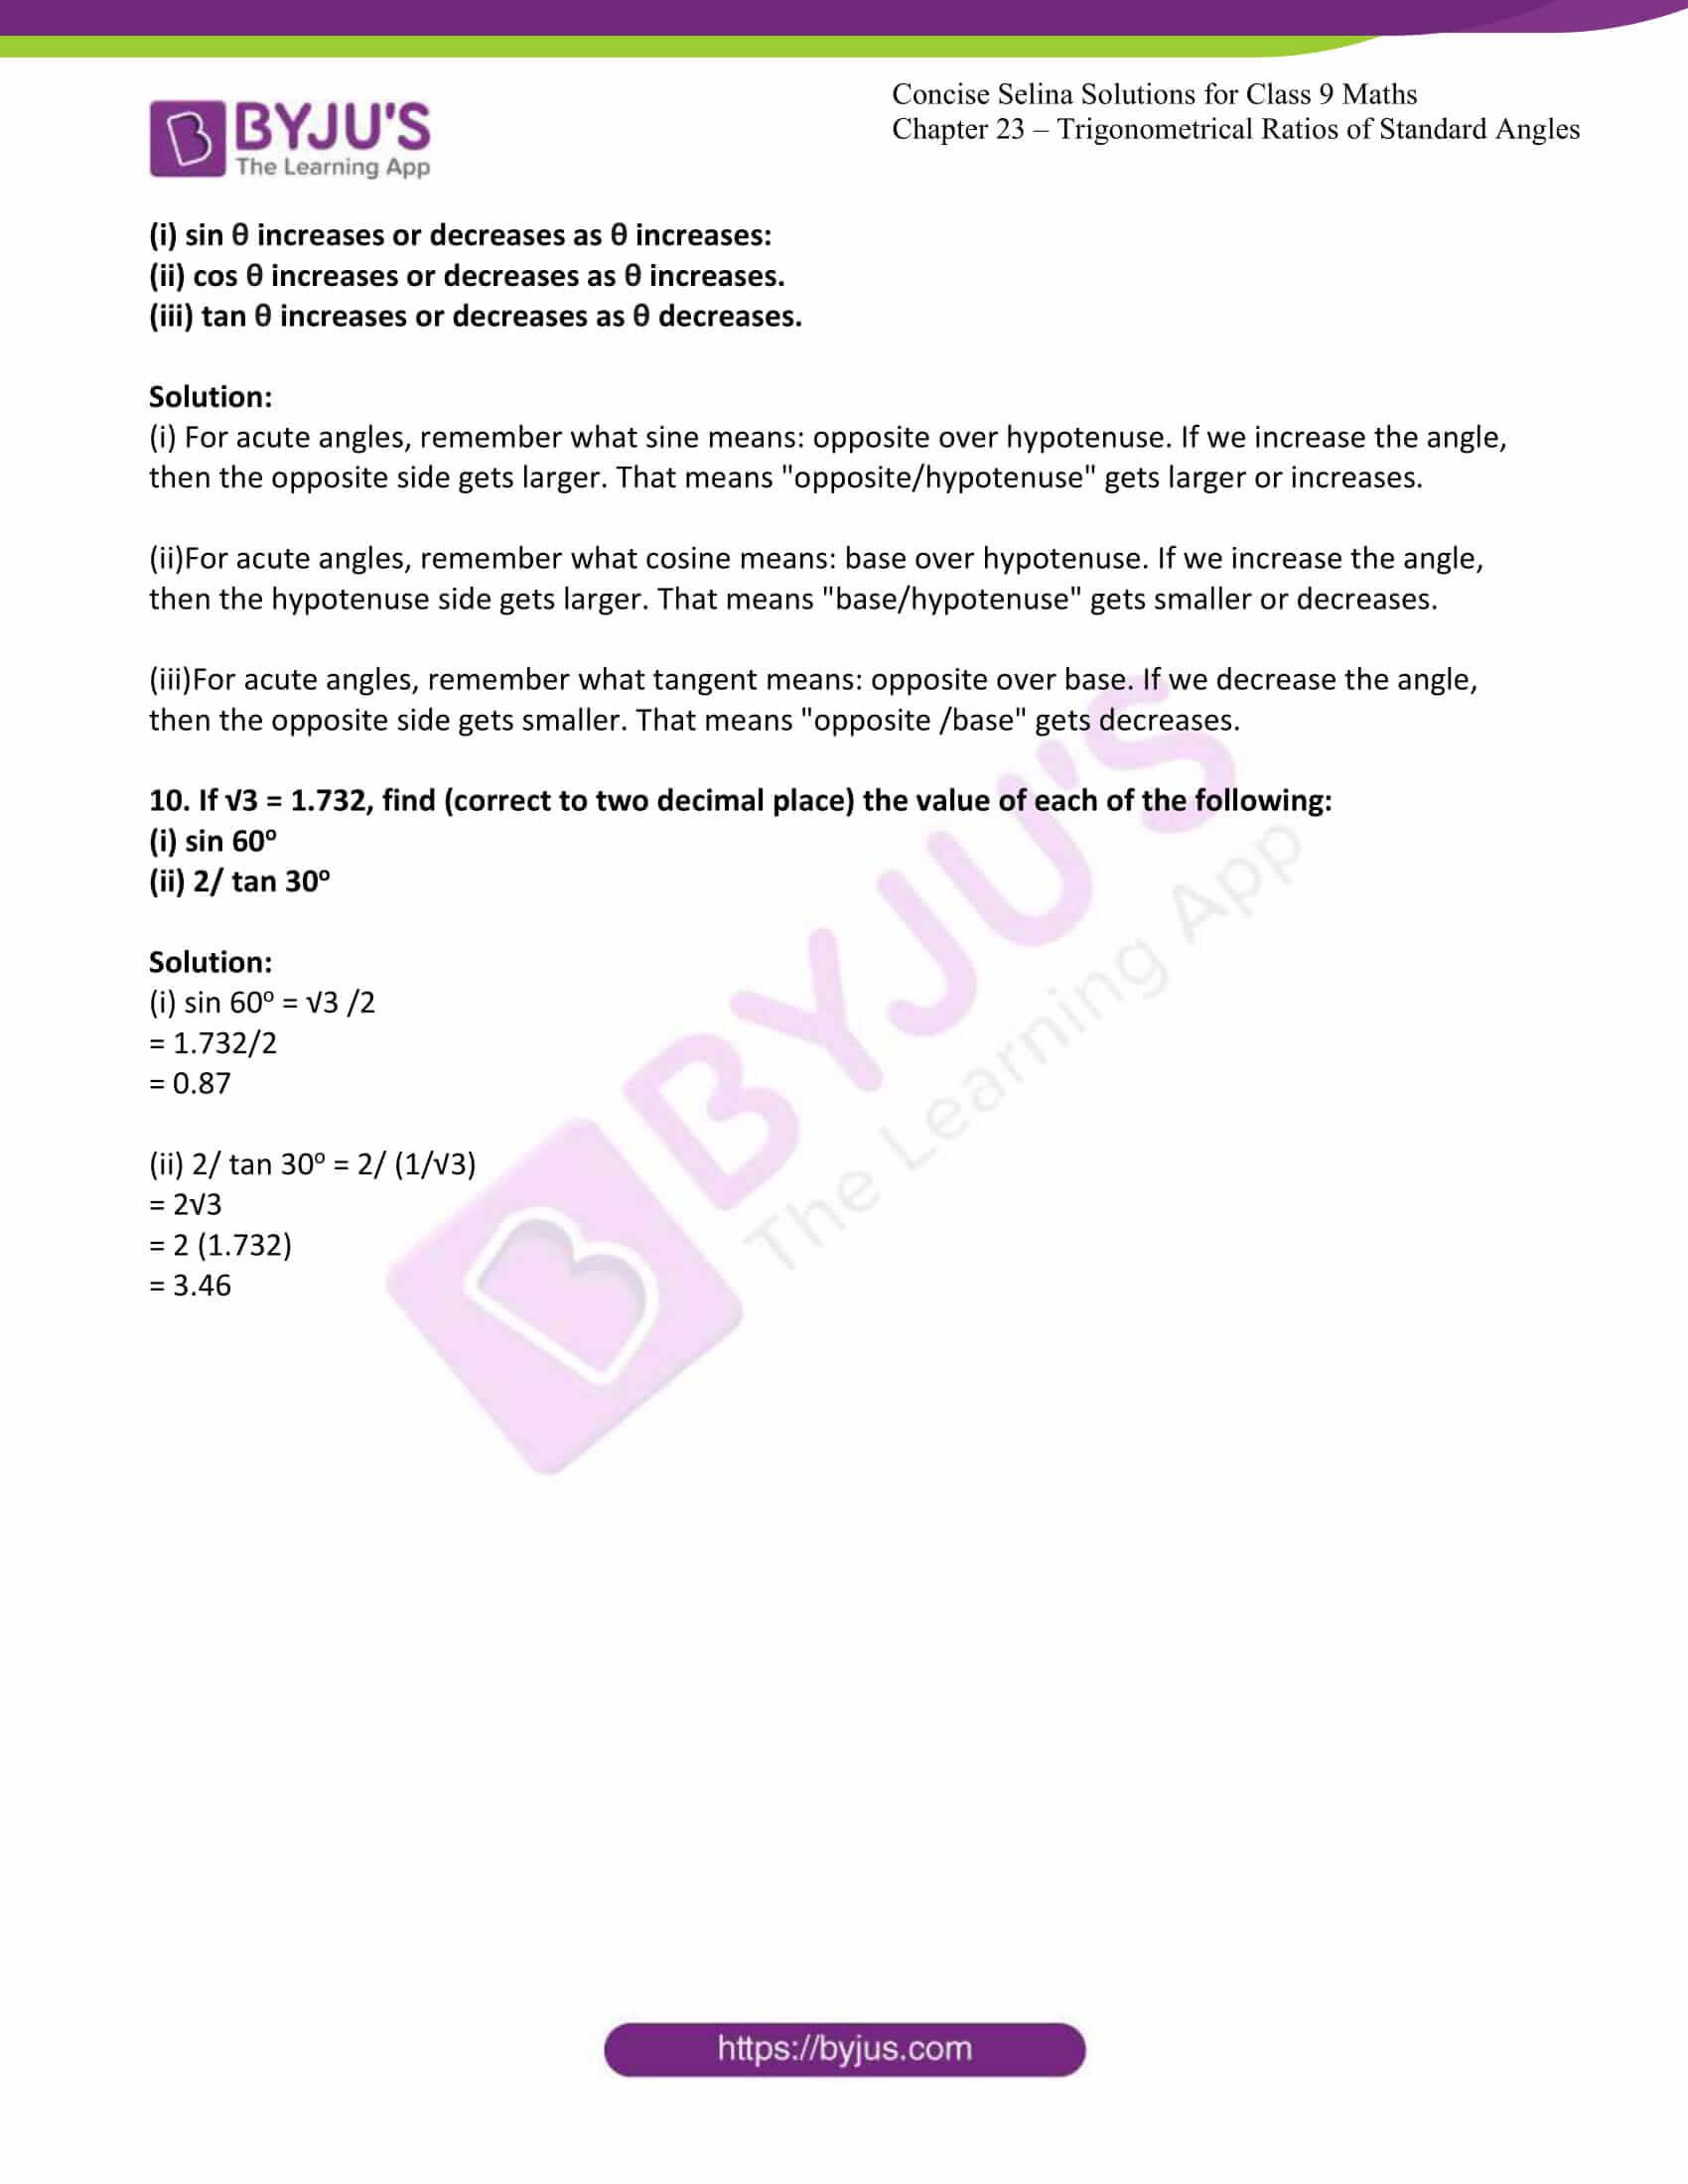 icse class 9 jun7 maths selina solutions chapter 23 trigonometrical ratios of standard angles 08